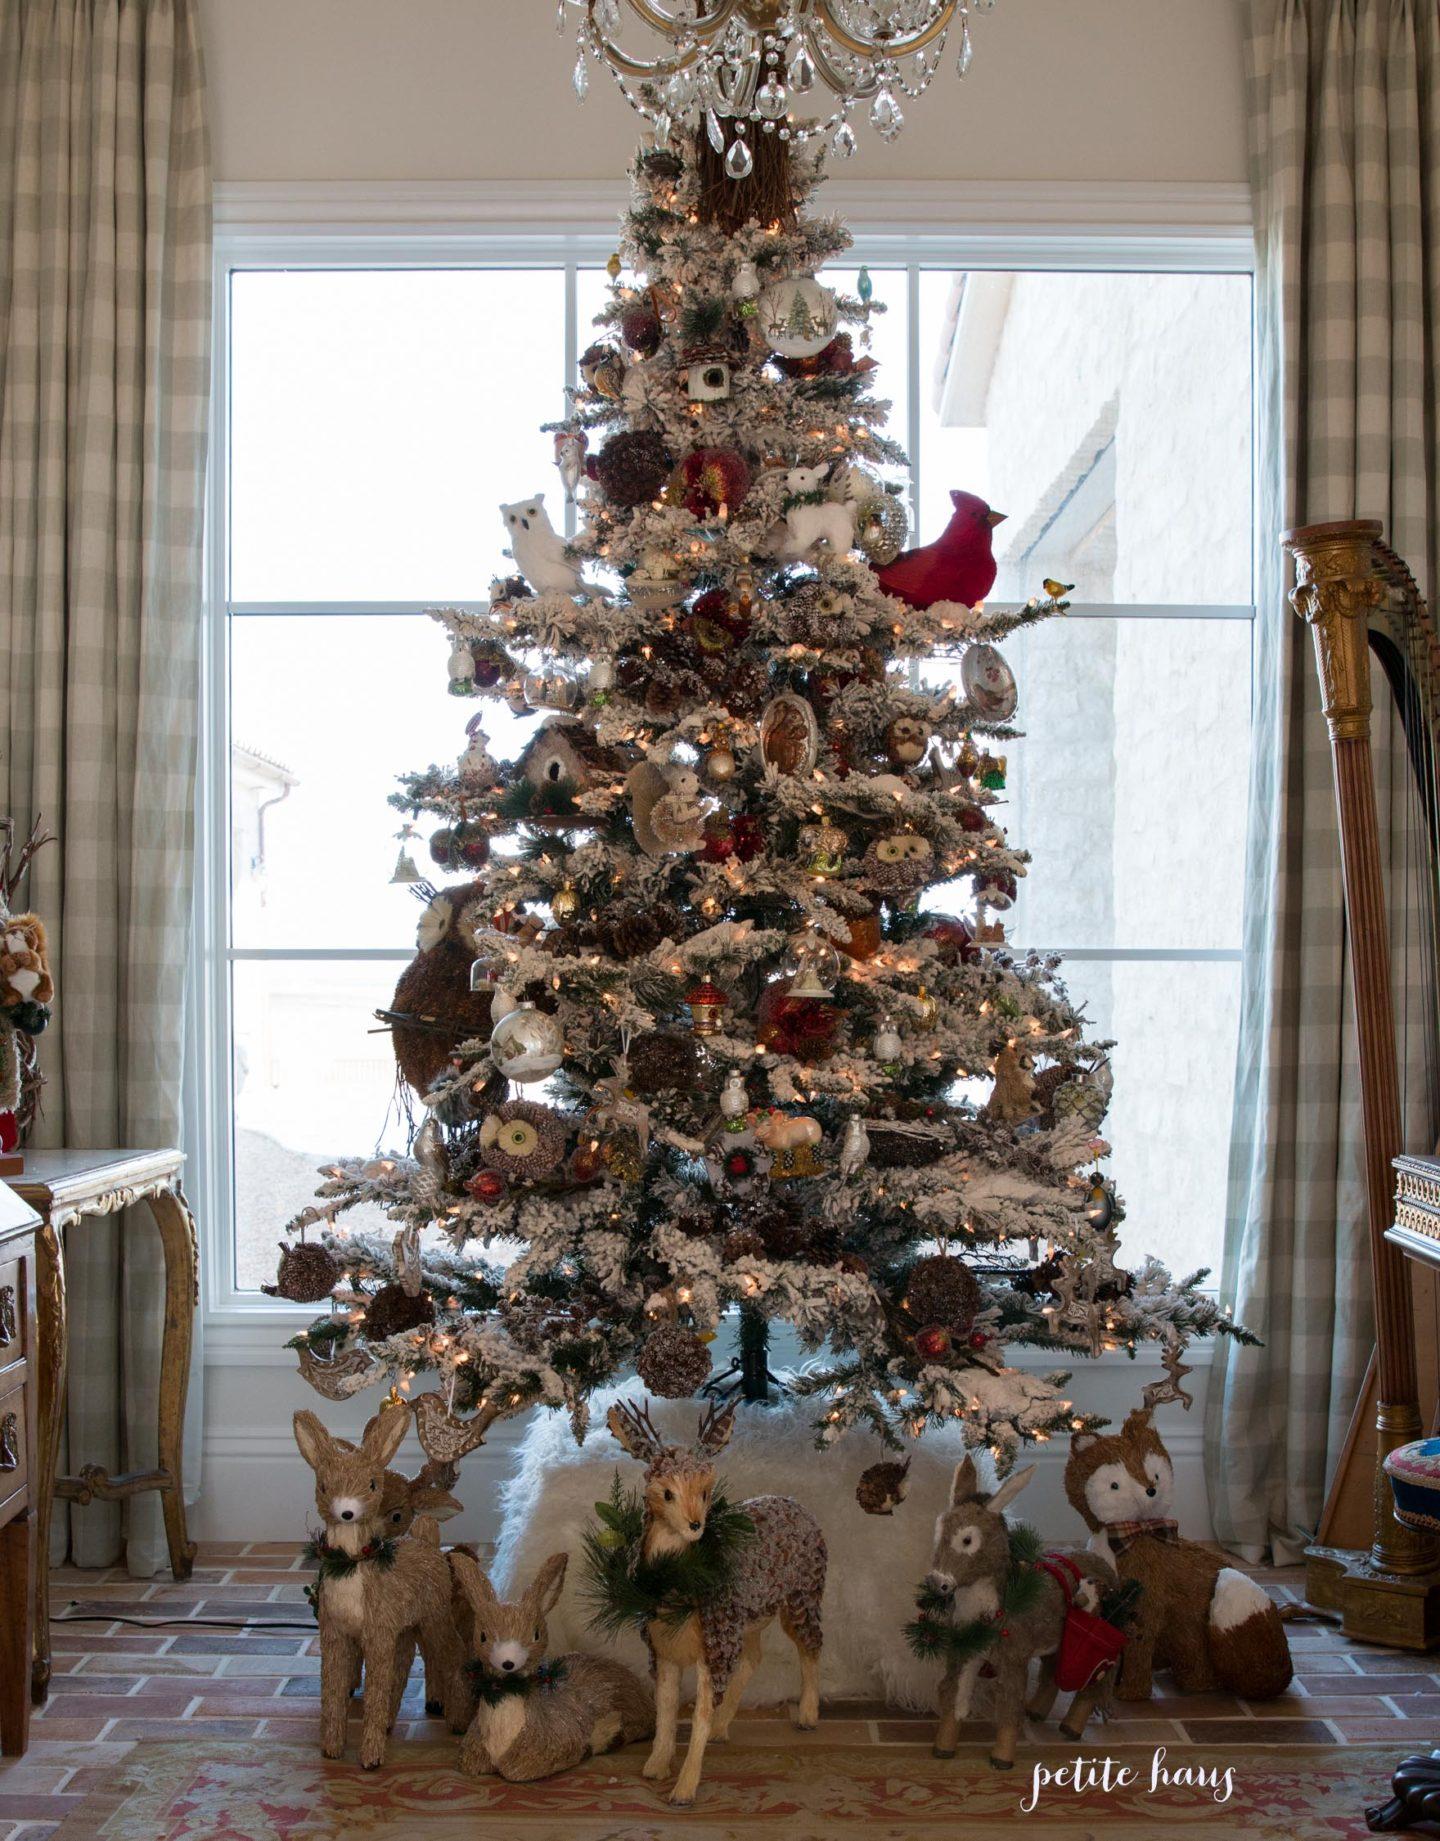 Choosing The Best Artificial Flocked Christmas Tree Petite Haus